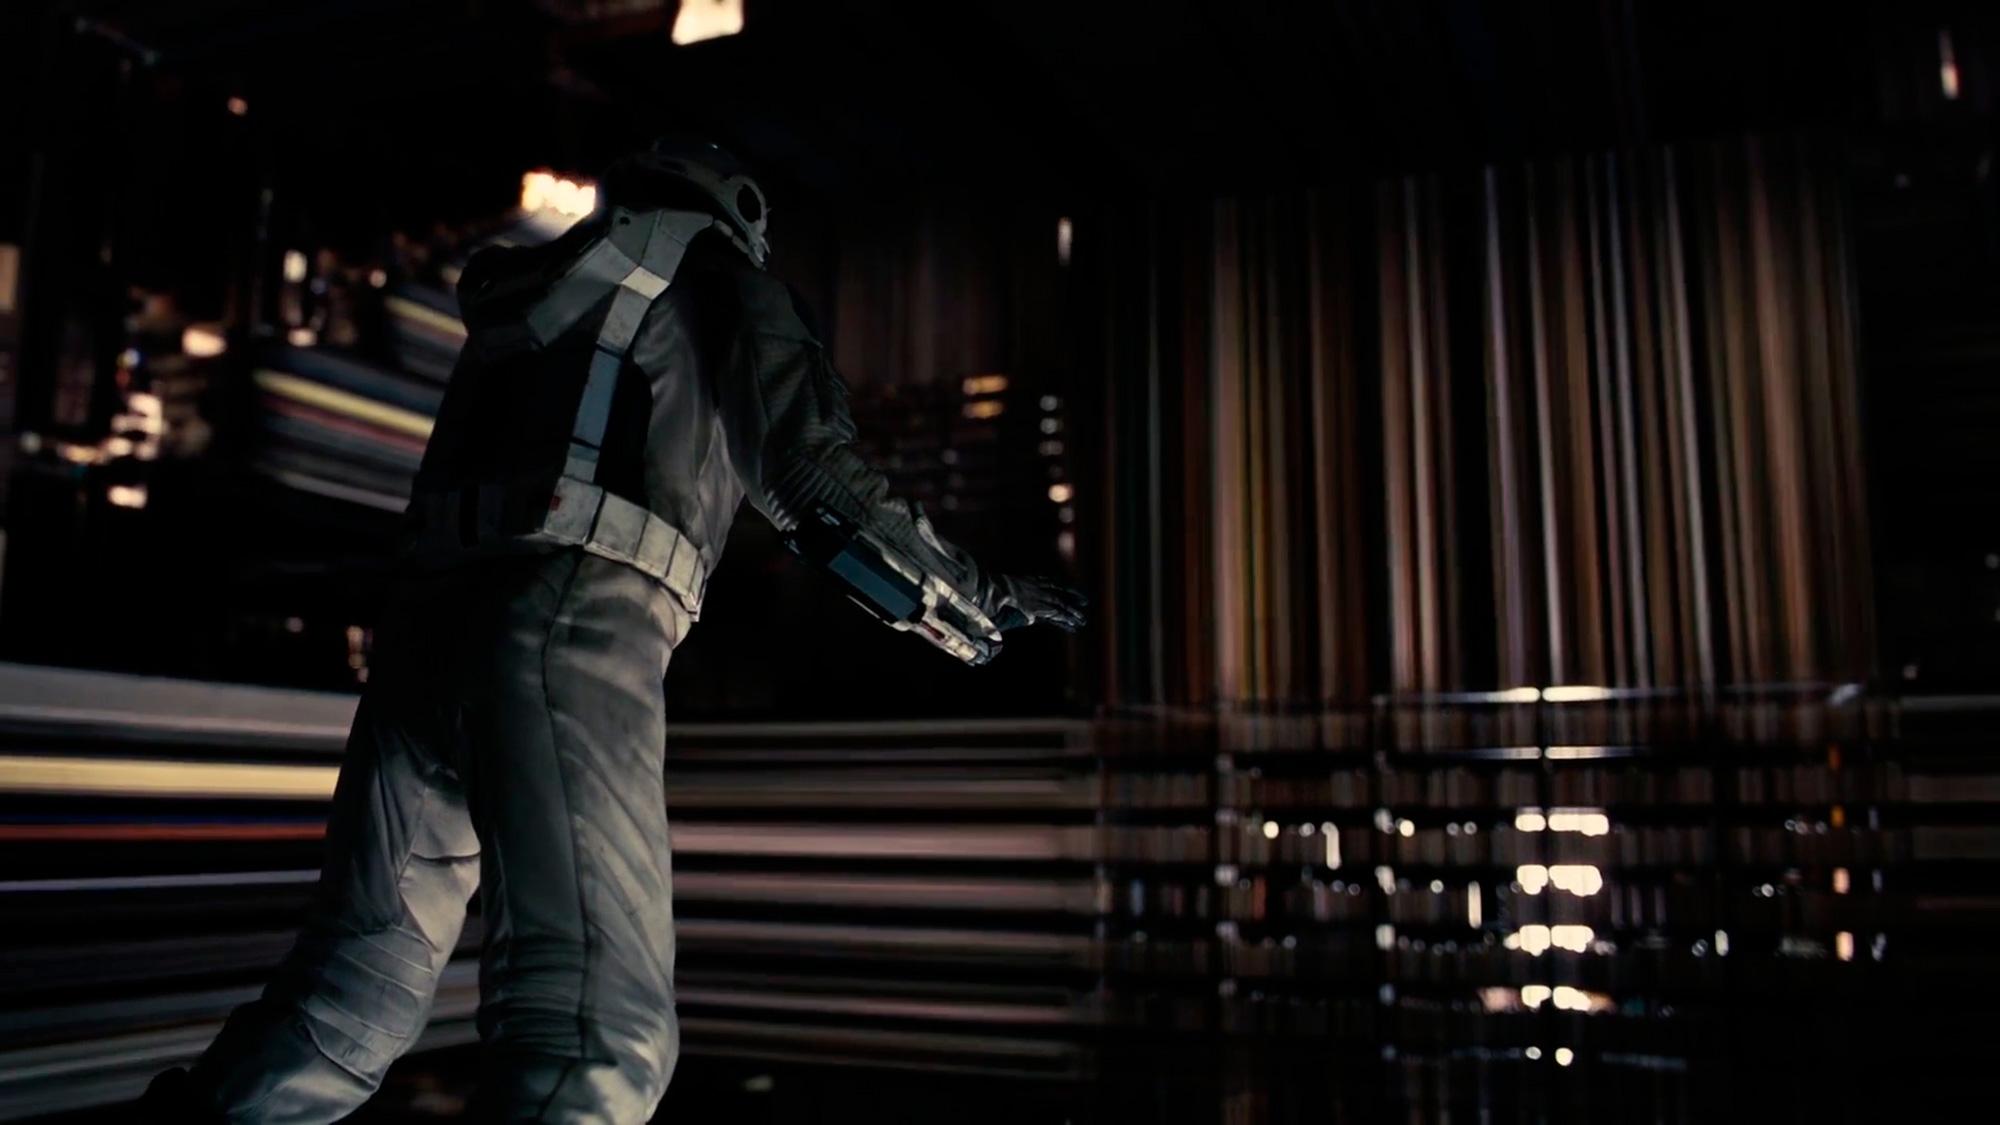 Chiều không gian thứ 5 trong Interstellar. Nguồn: Warner Bros